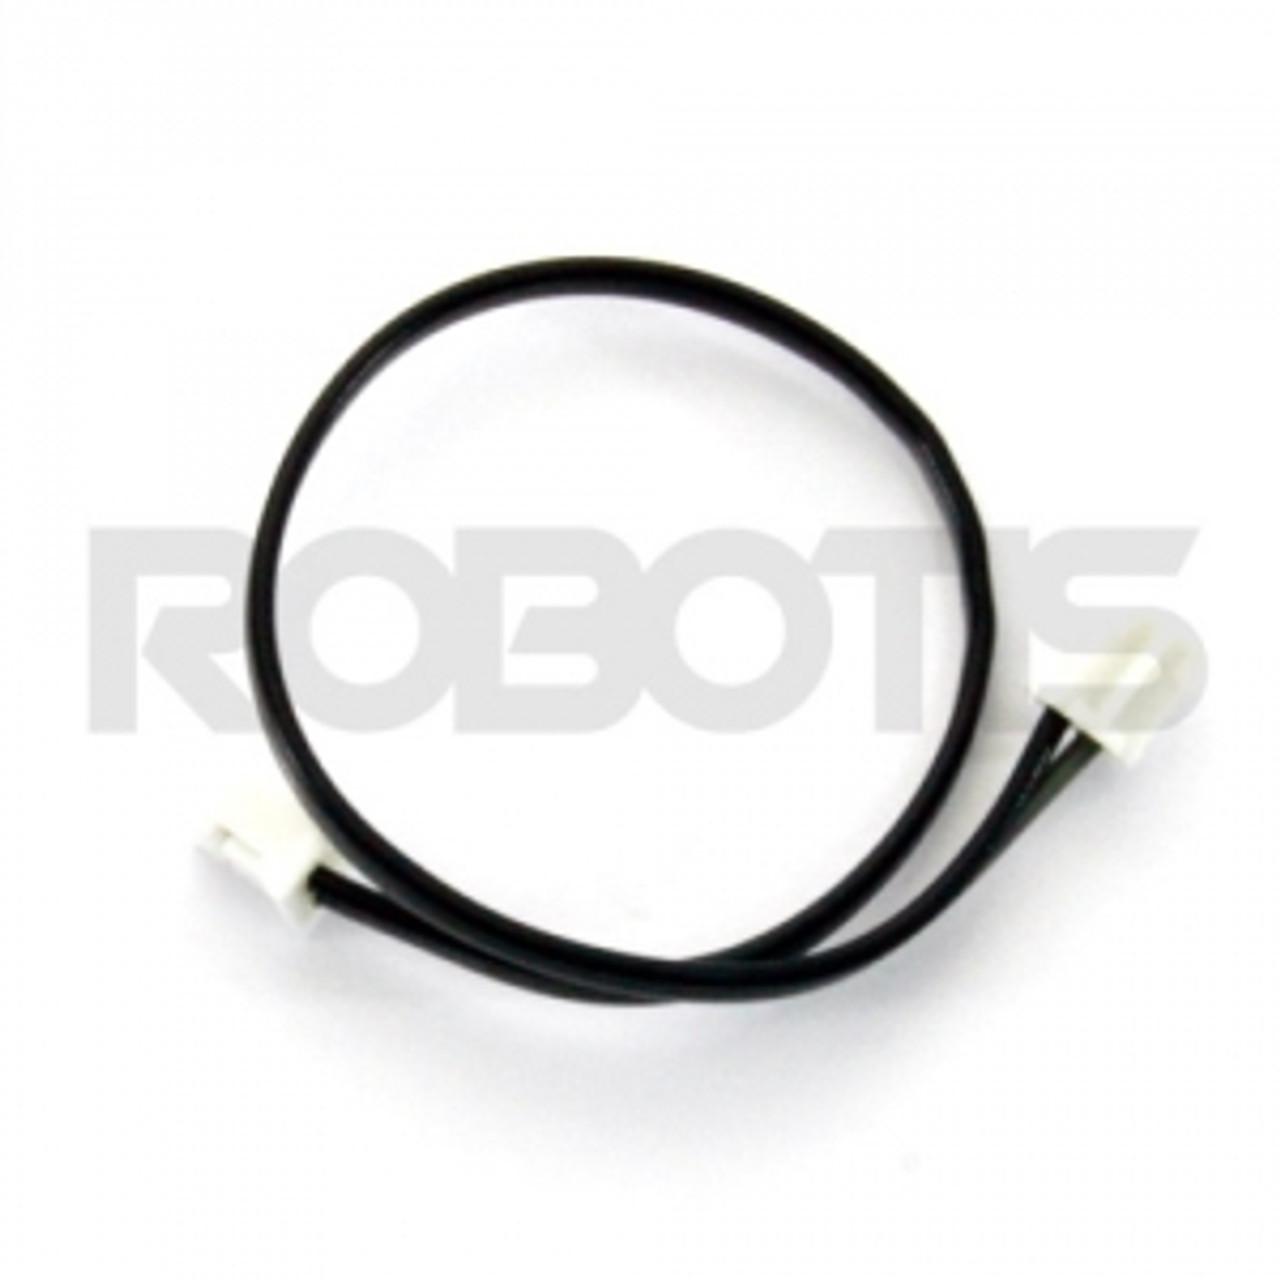 Robot Cable-2P 150mm (Battery Box) 4pcs